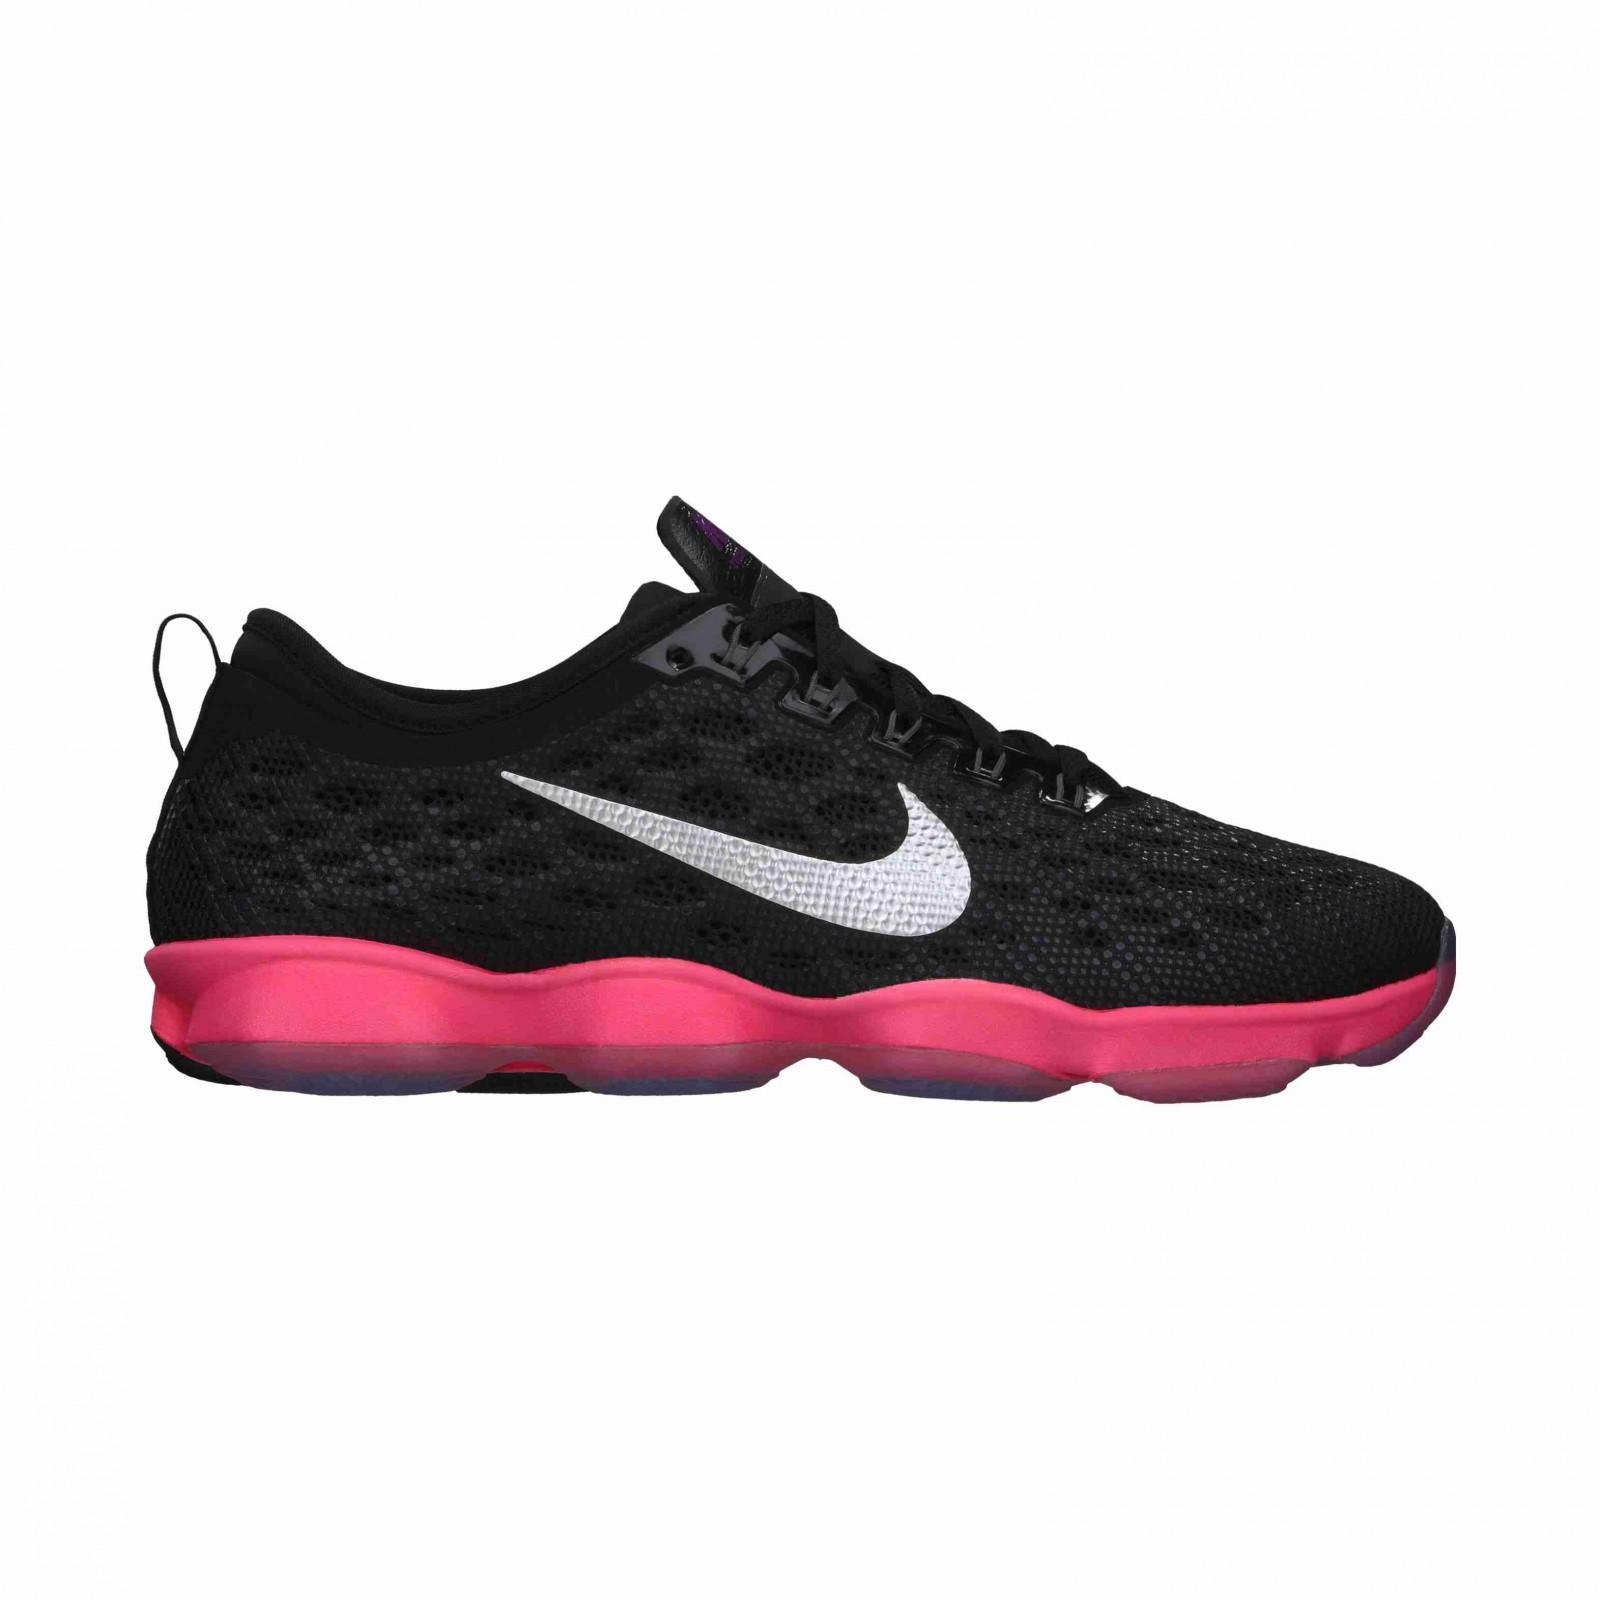 37c16b444eb Dámská fitness obuv Nike WMNS ZOOM FIT AGILITY